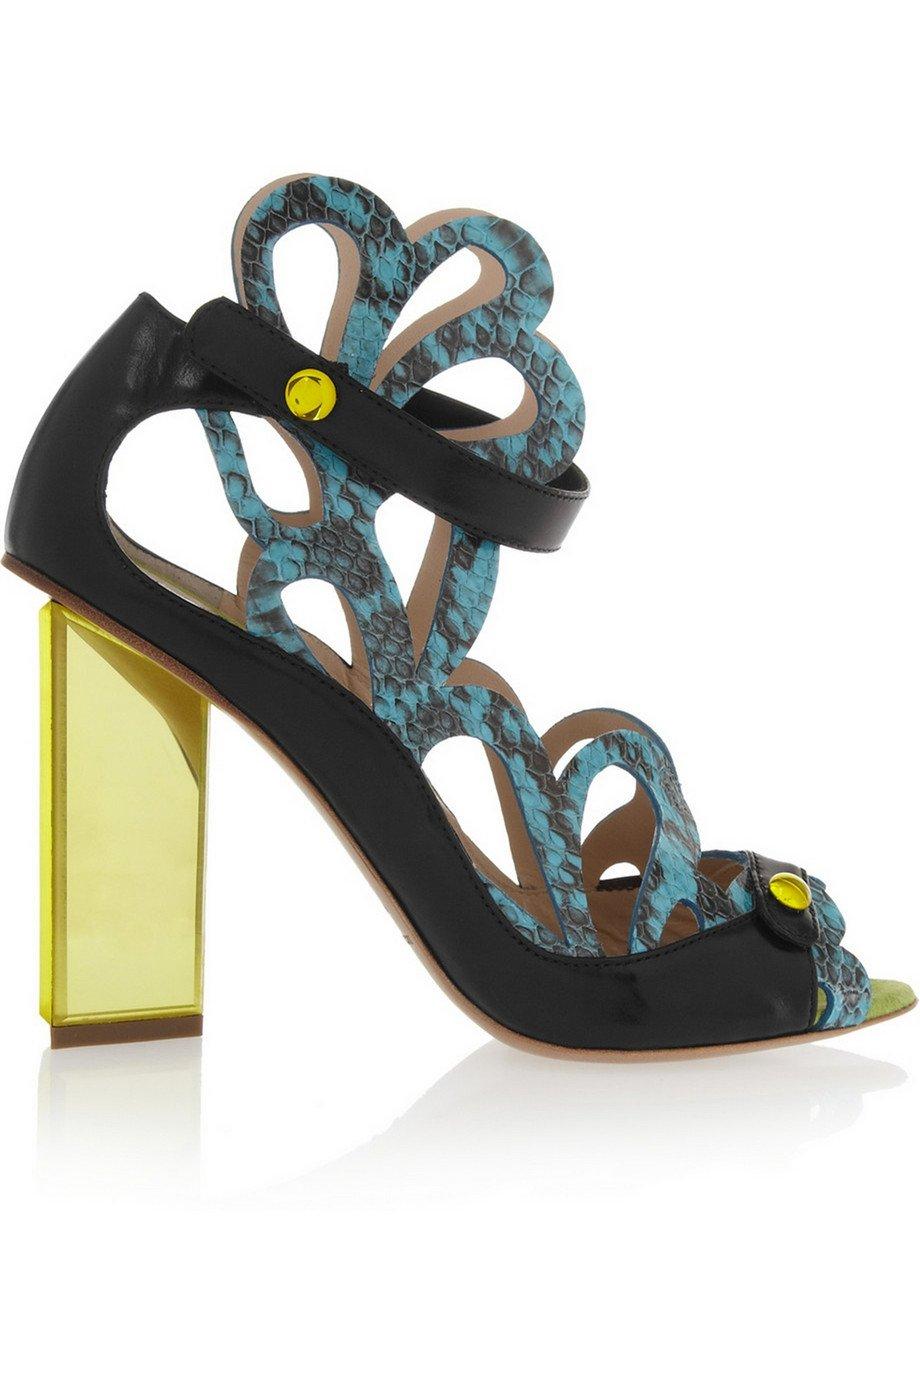 Nicholas Kirkwood Laser-cut Snake Pumps 6 Black/Turq/Yellow